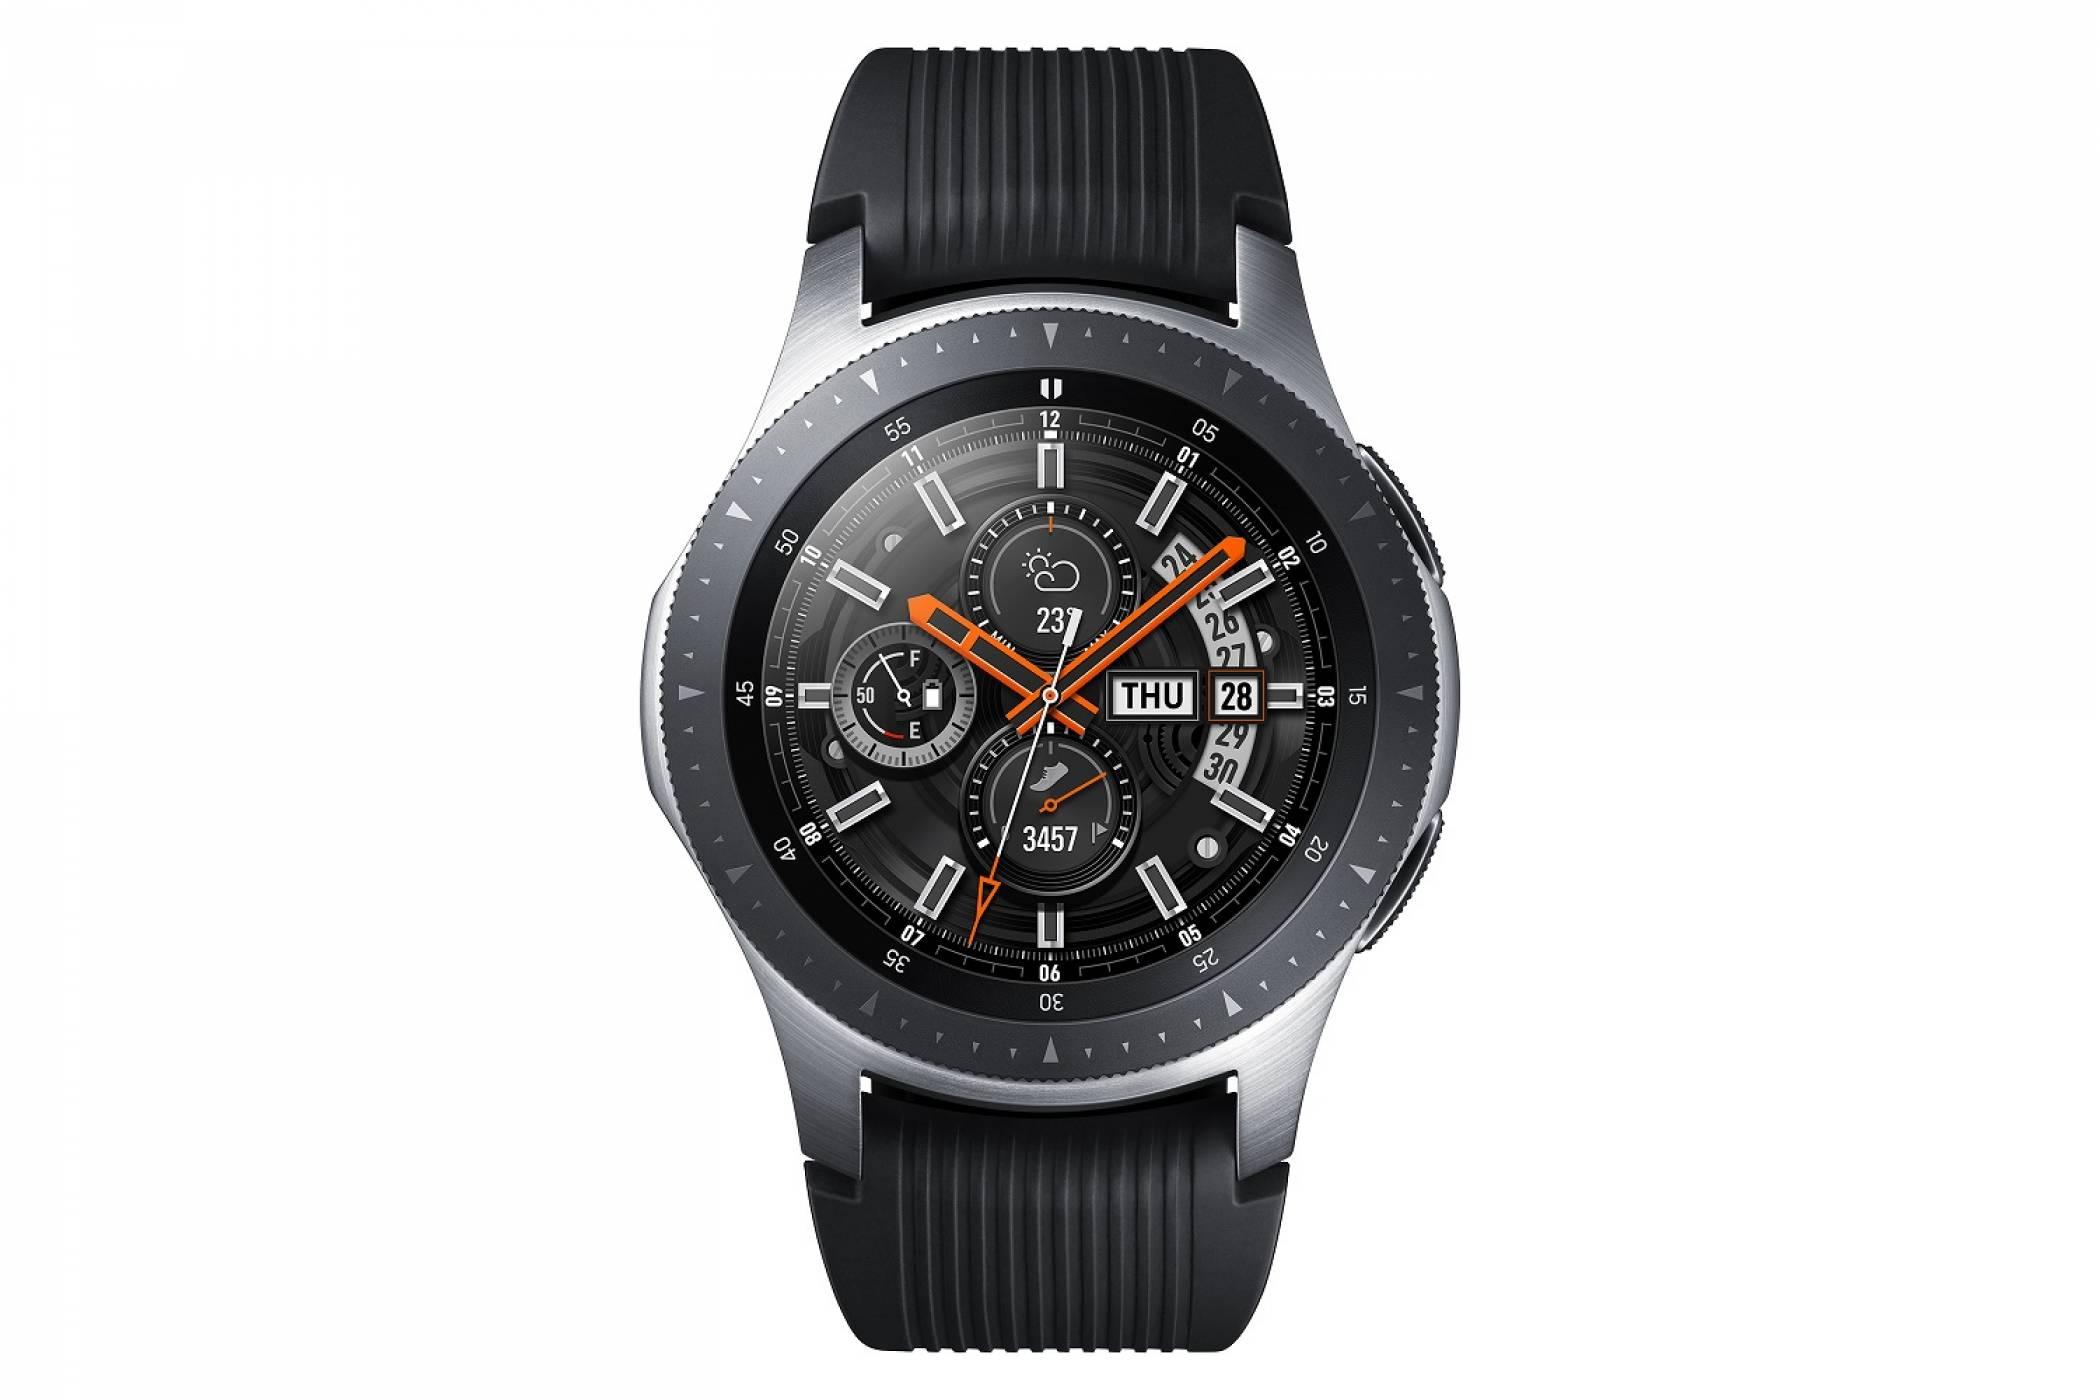 MWC2019: Samsung Galaxy Watch е новият крал при умните часовници